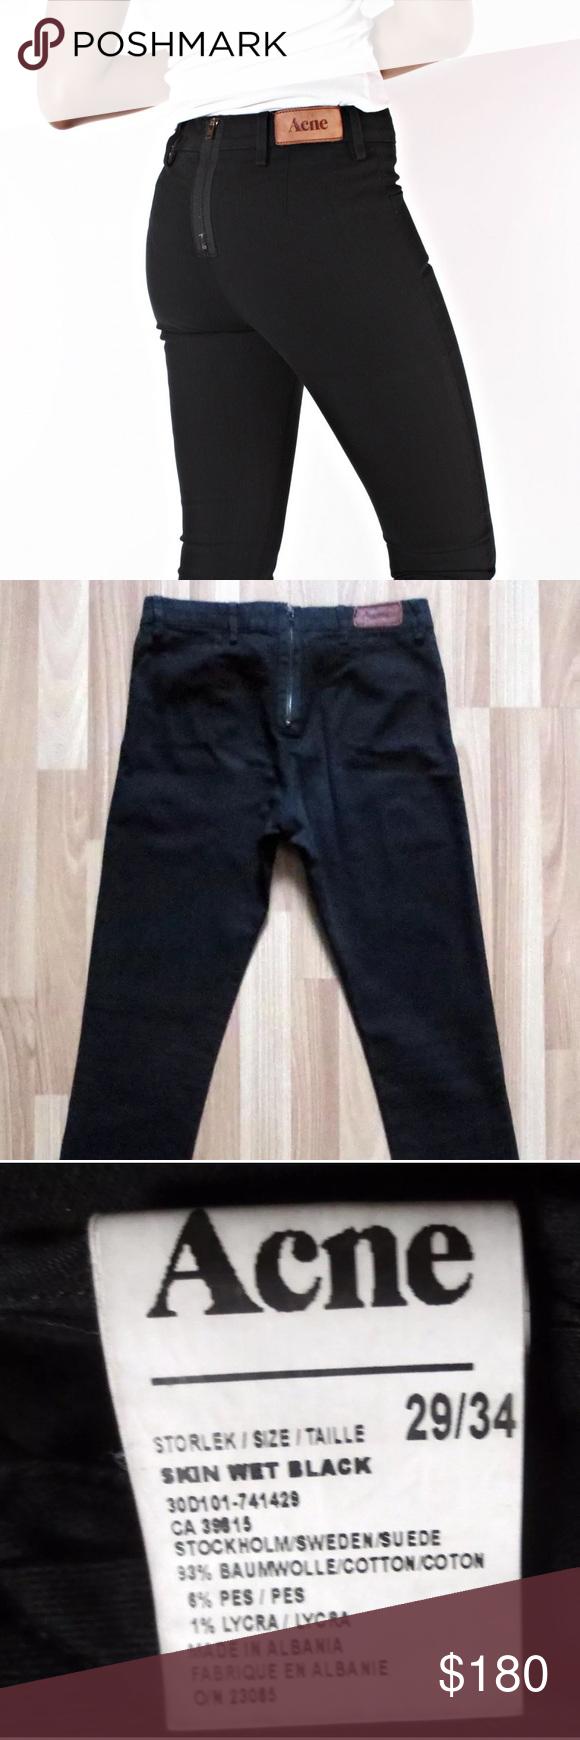 acne skin wet black jeans